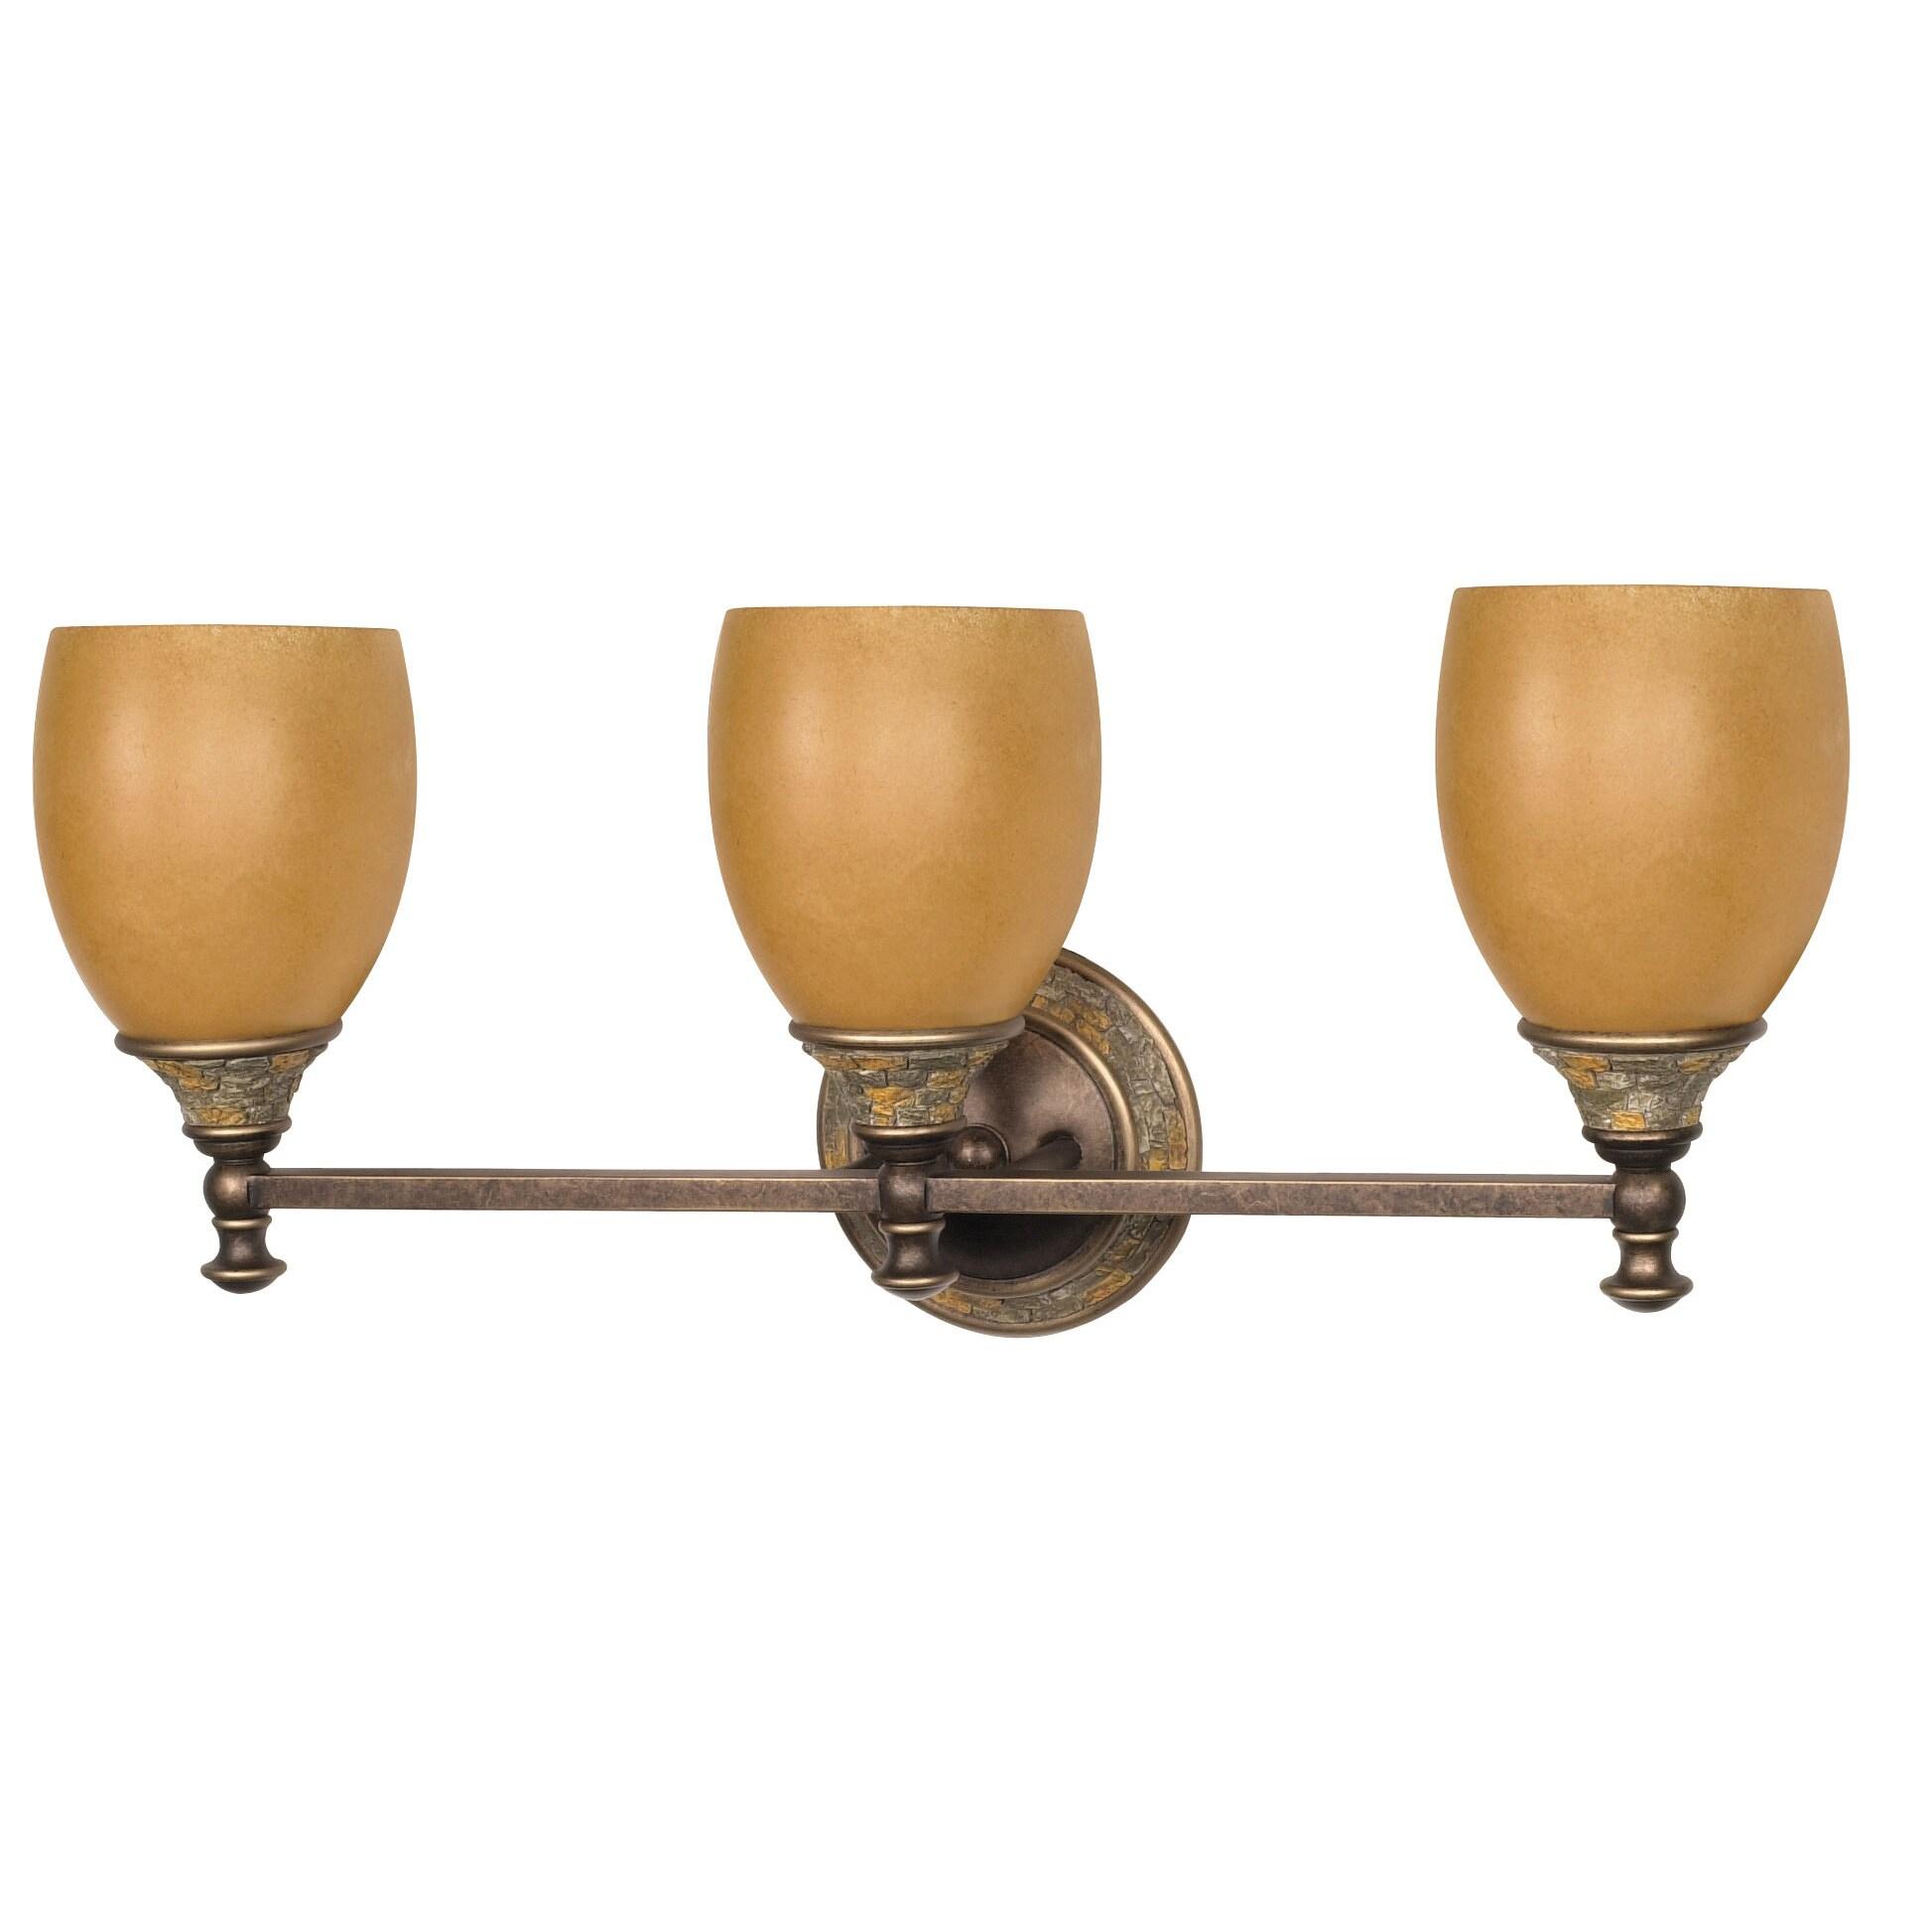 Rockport Tuscano 3 Light Dorado Bronze With Sepia Colored Glass Shades Vanity